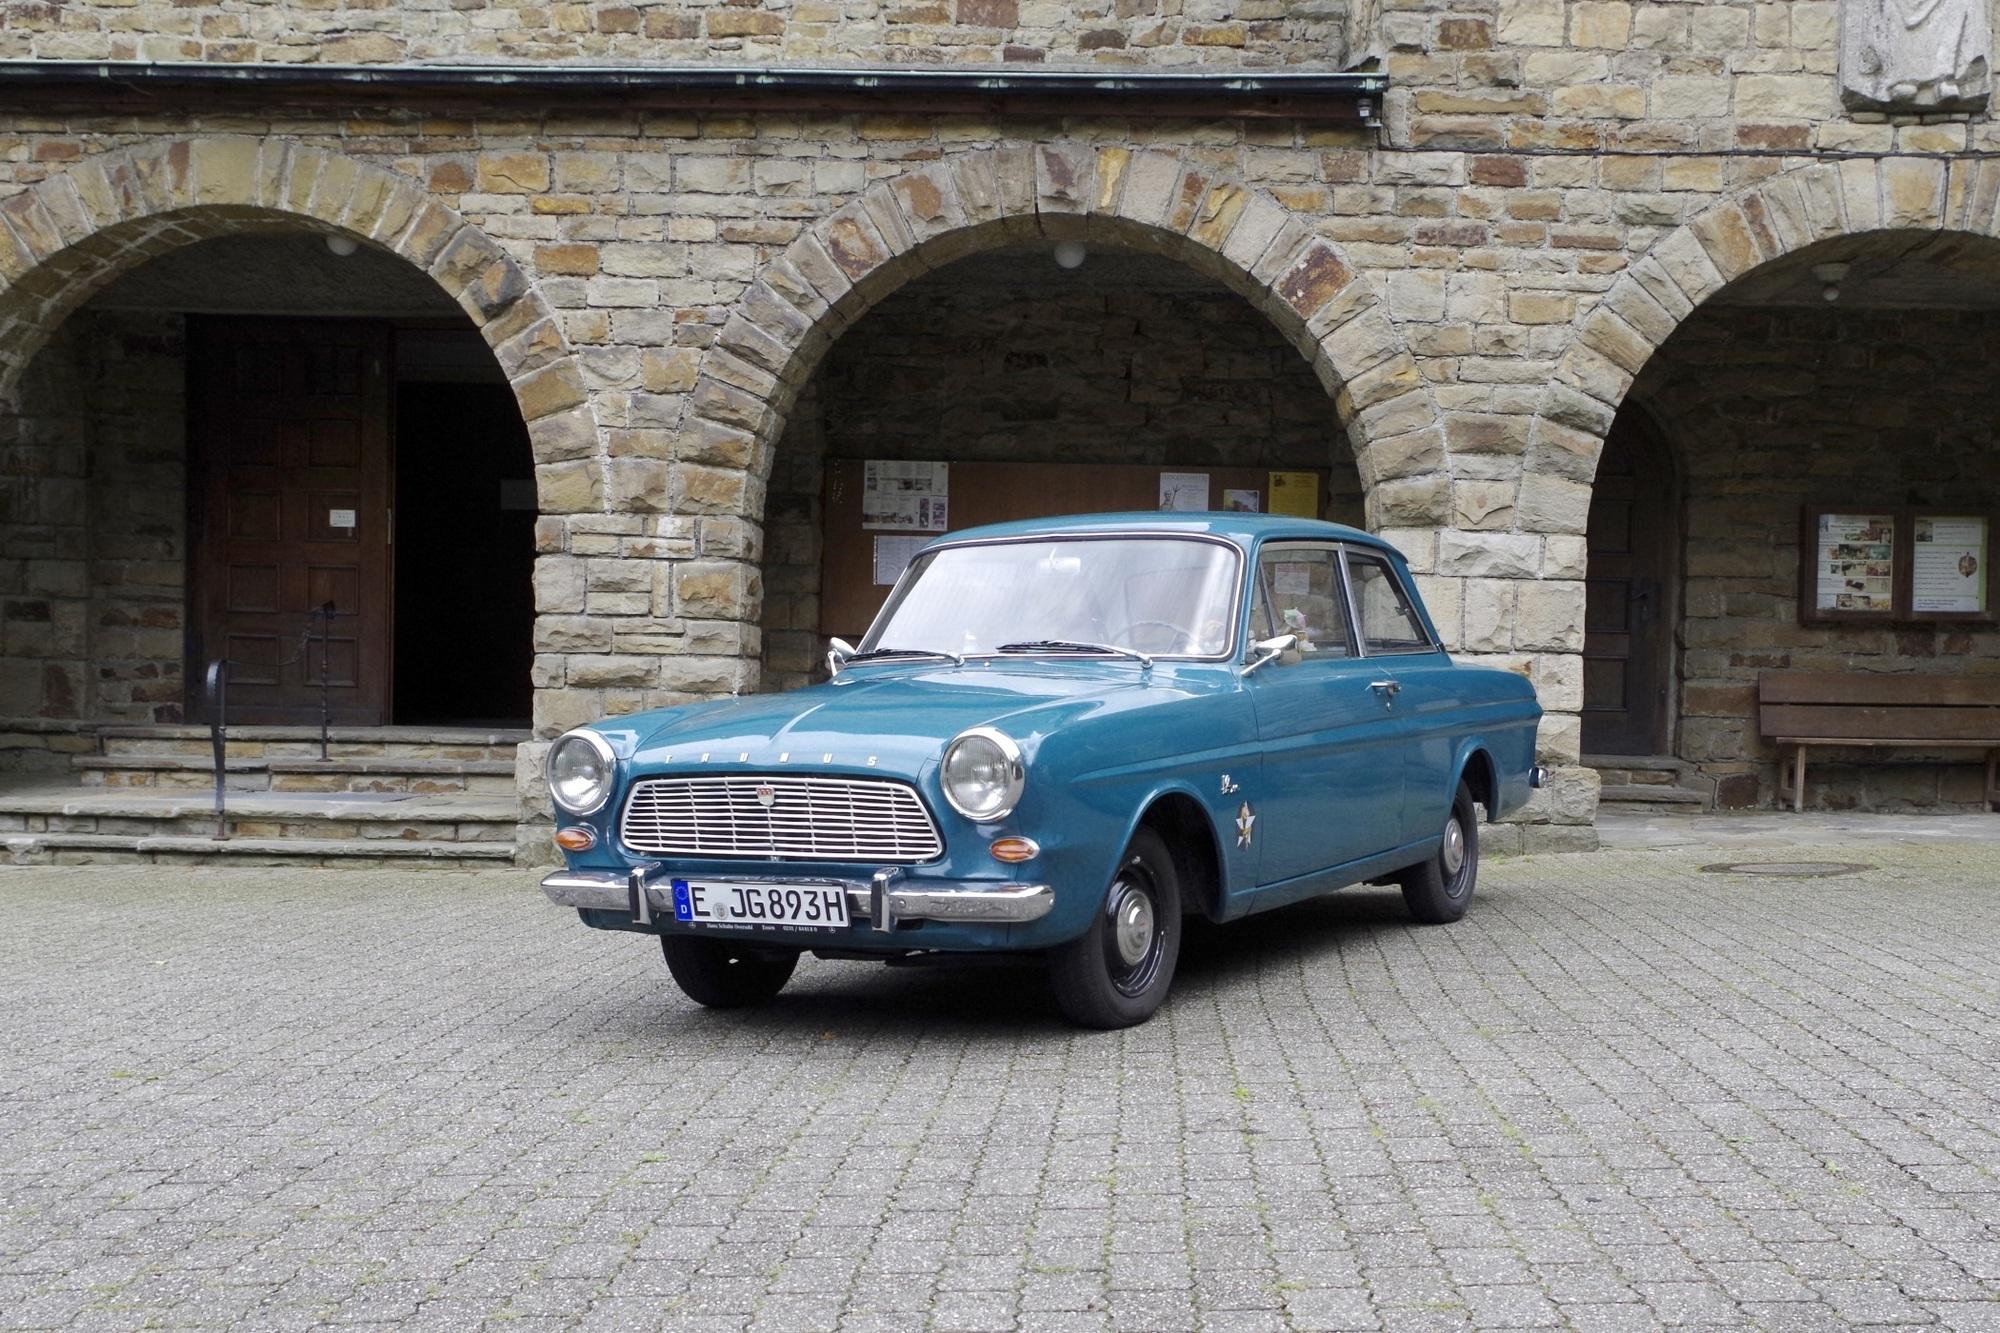 Oldtimer im Test: Ford 12M - Rauer Charme zum fairen Preis